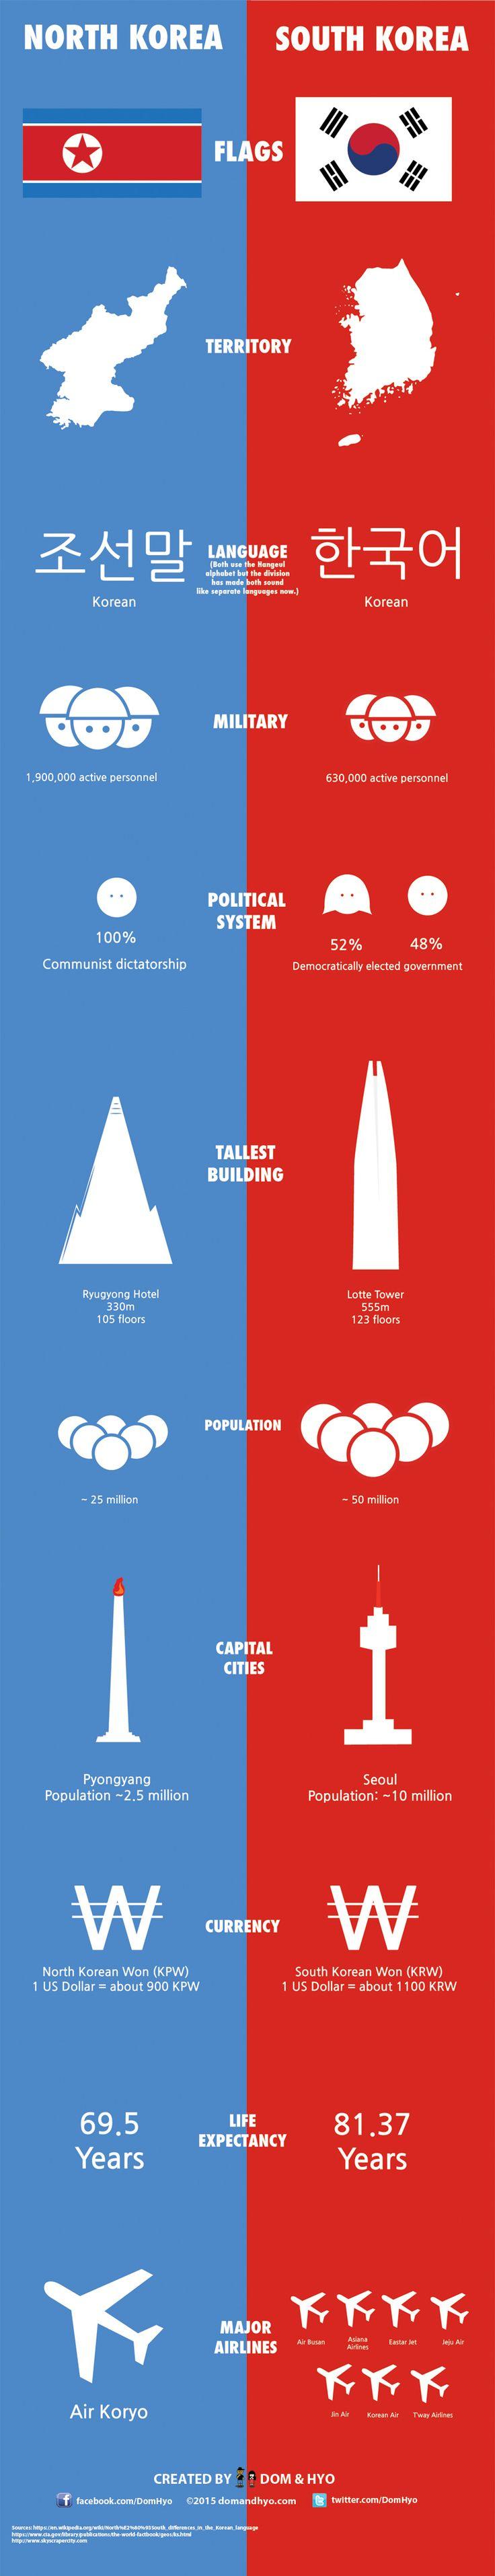 north korea, south korea, differences